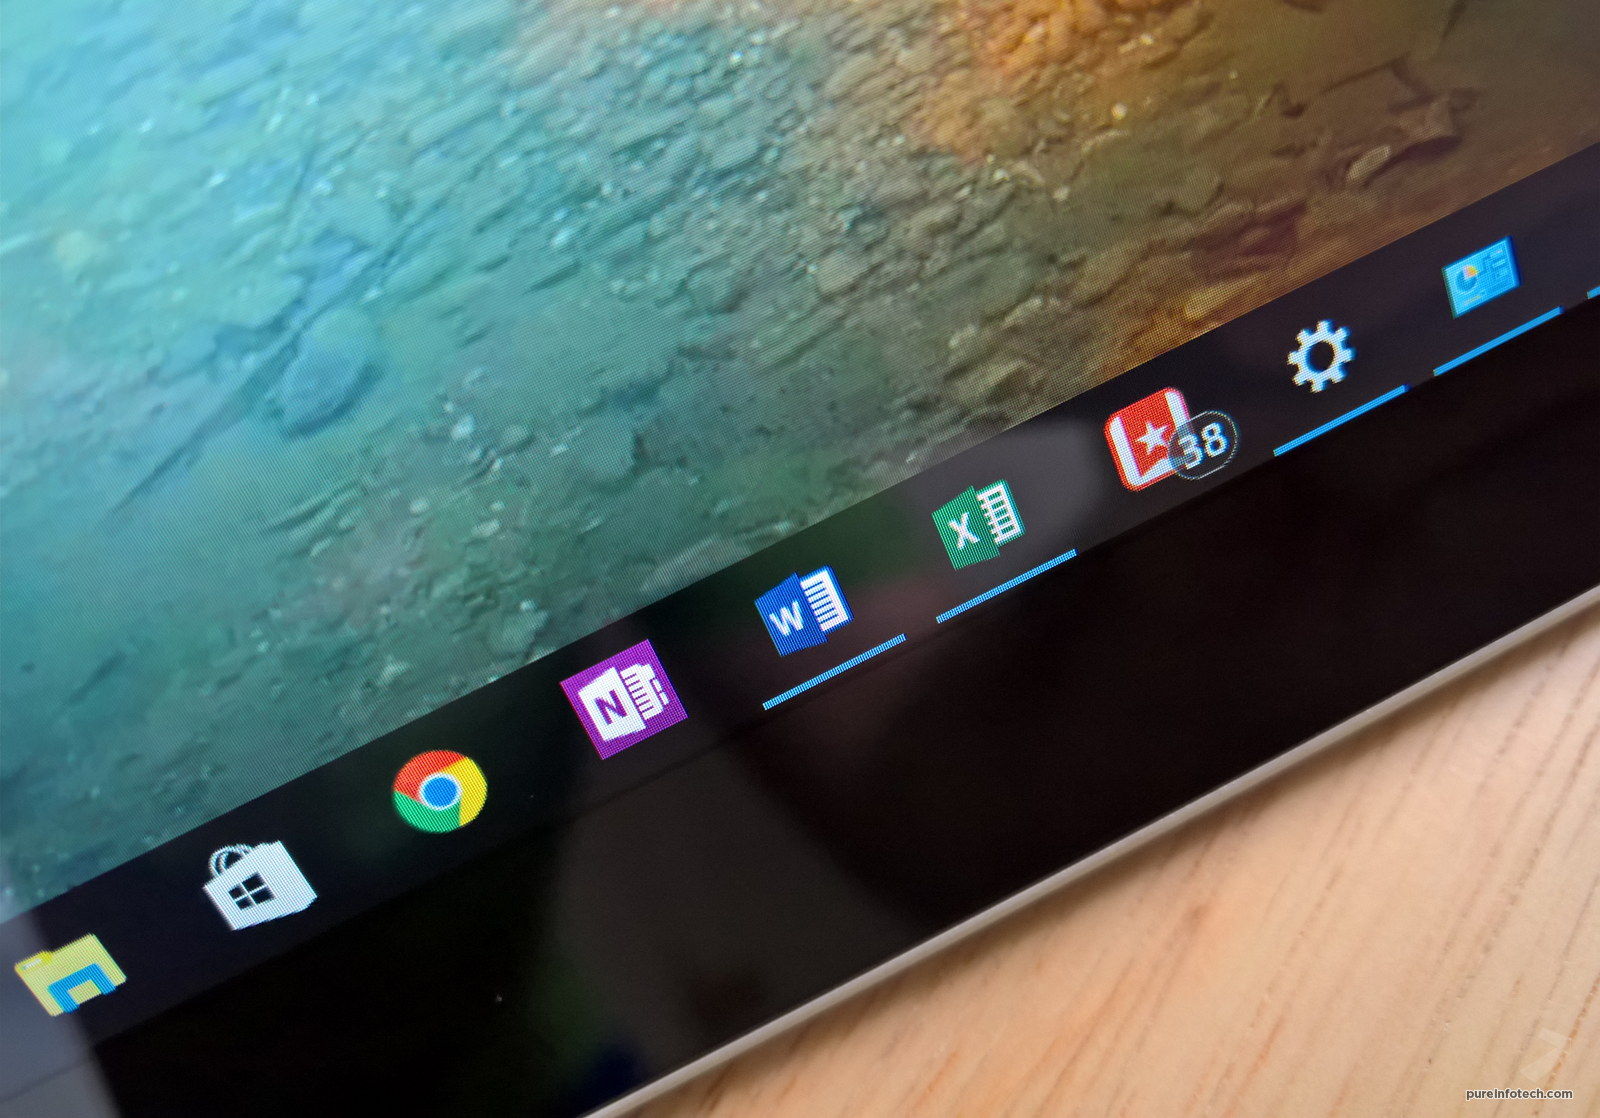 Microsoft Office apps pinned on the taskbar